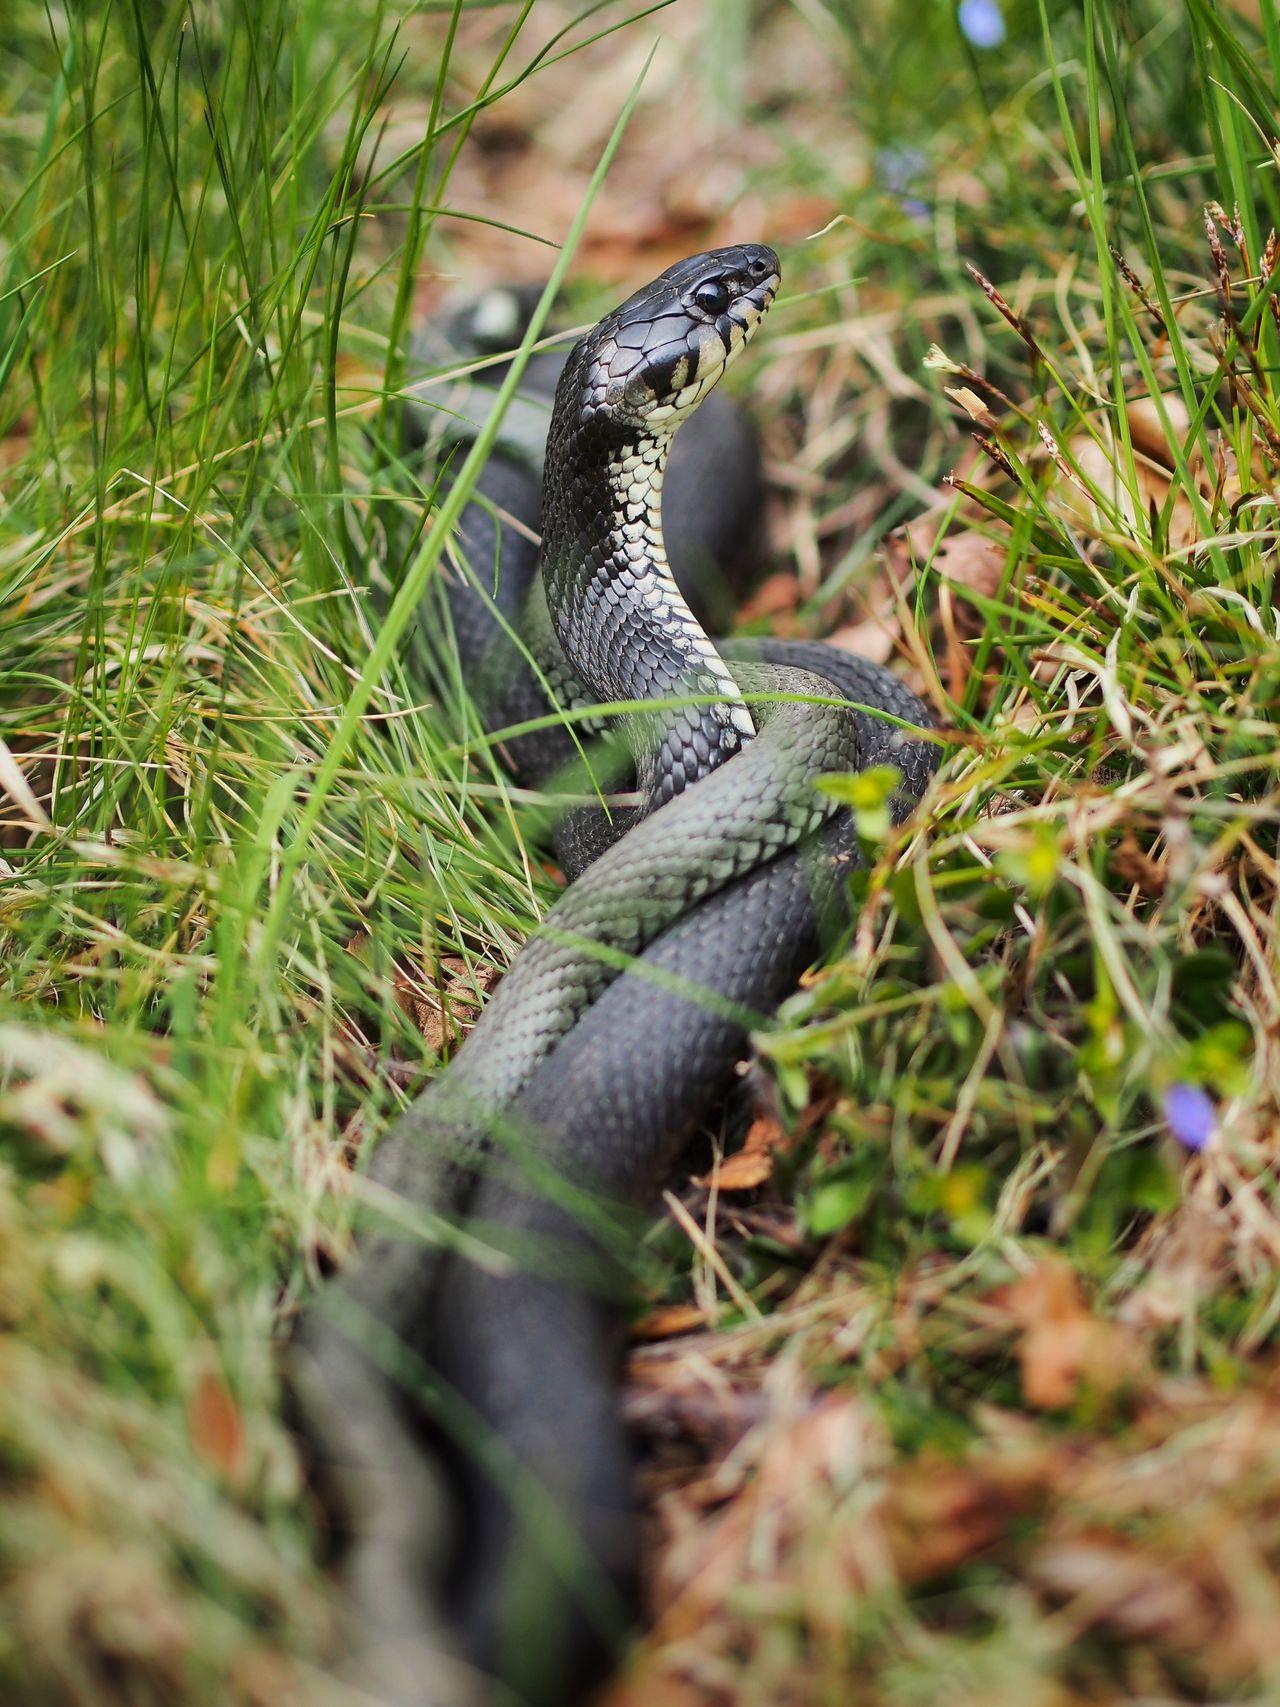 Natrix Natrix Grass Snake Snake Snok M.Zuiko 45mm 1:1,8